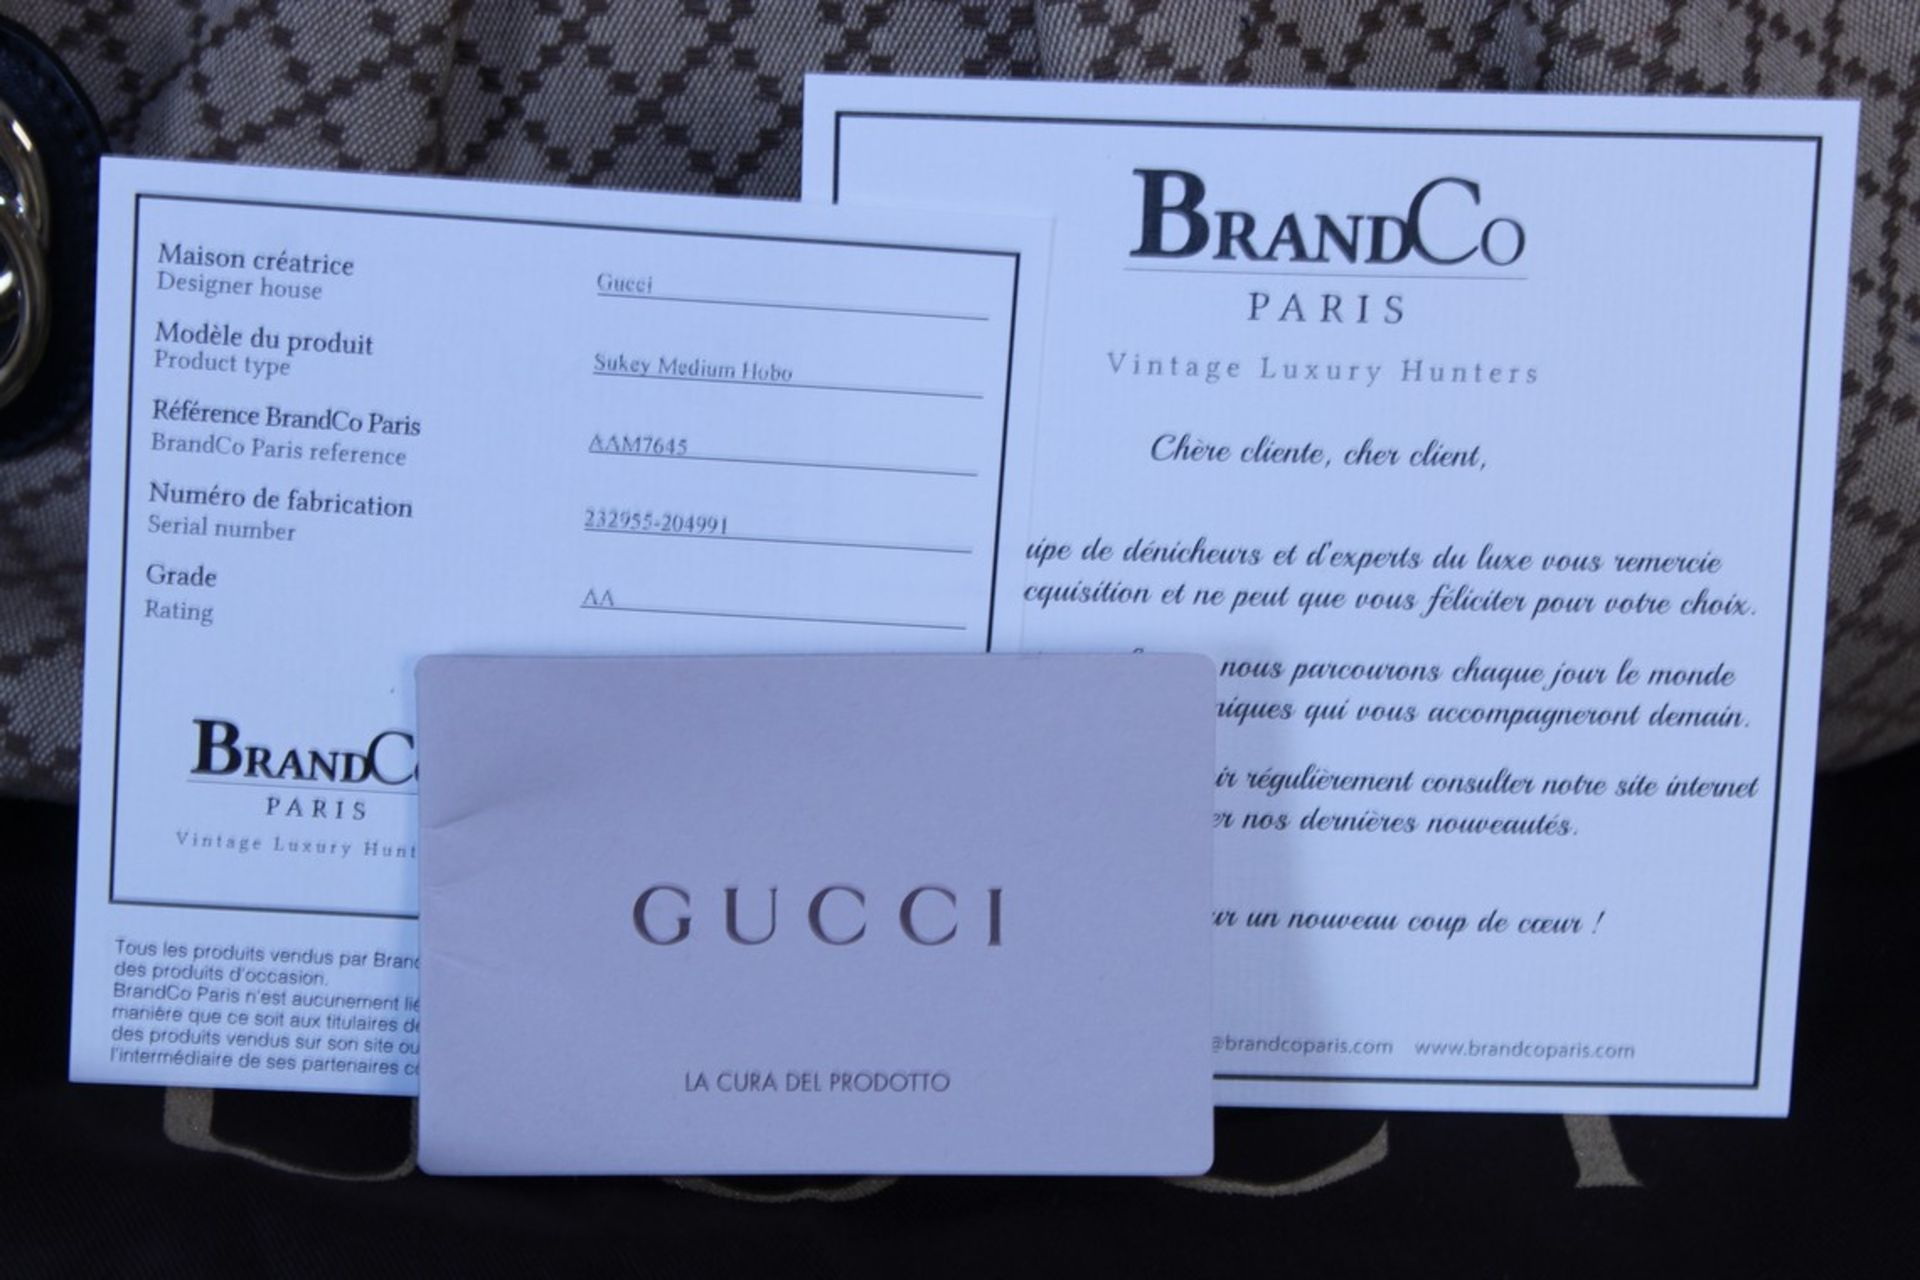 RRP £1,500 Gucci Sukey Medium Shoulder Bag, Beige/Black Diamante Canvas, 37.5X26X10Cm (Production - Image 4 of 4